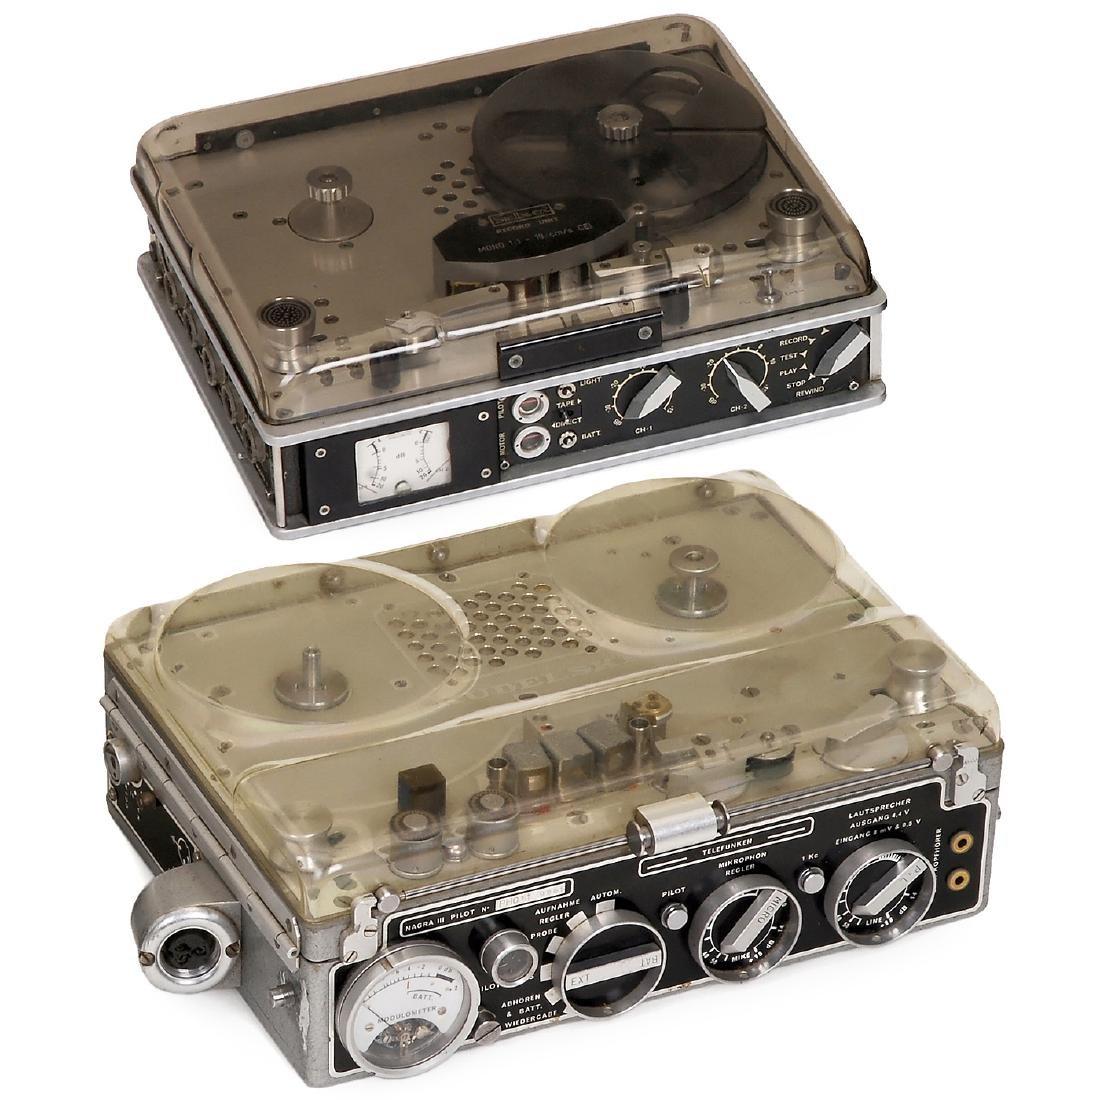 2 Pilottone Tape Recorders